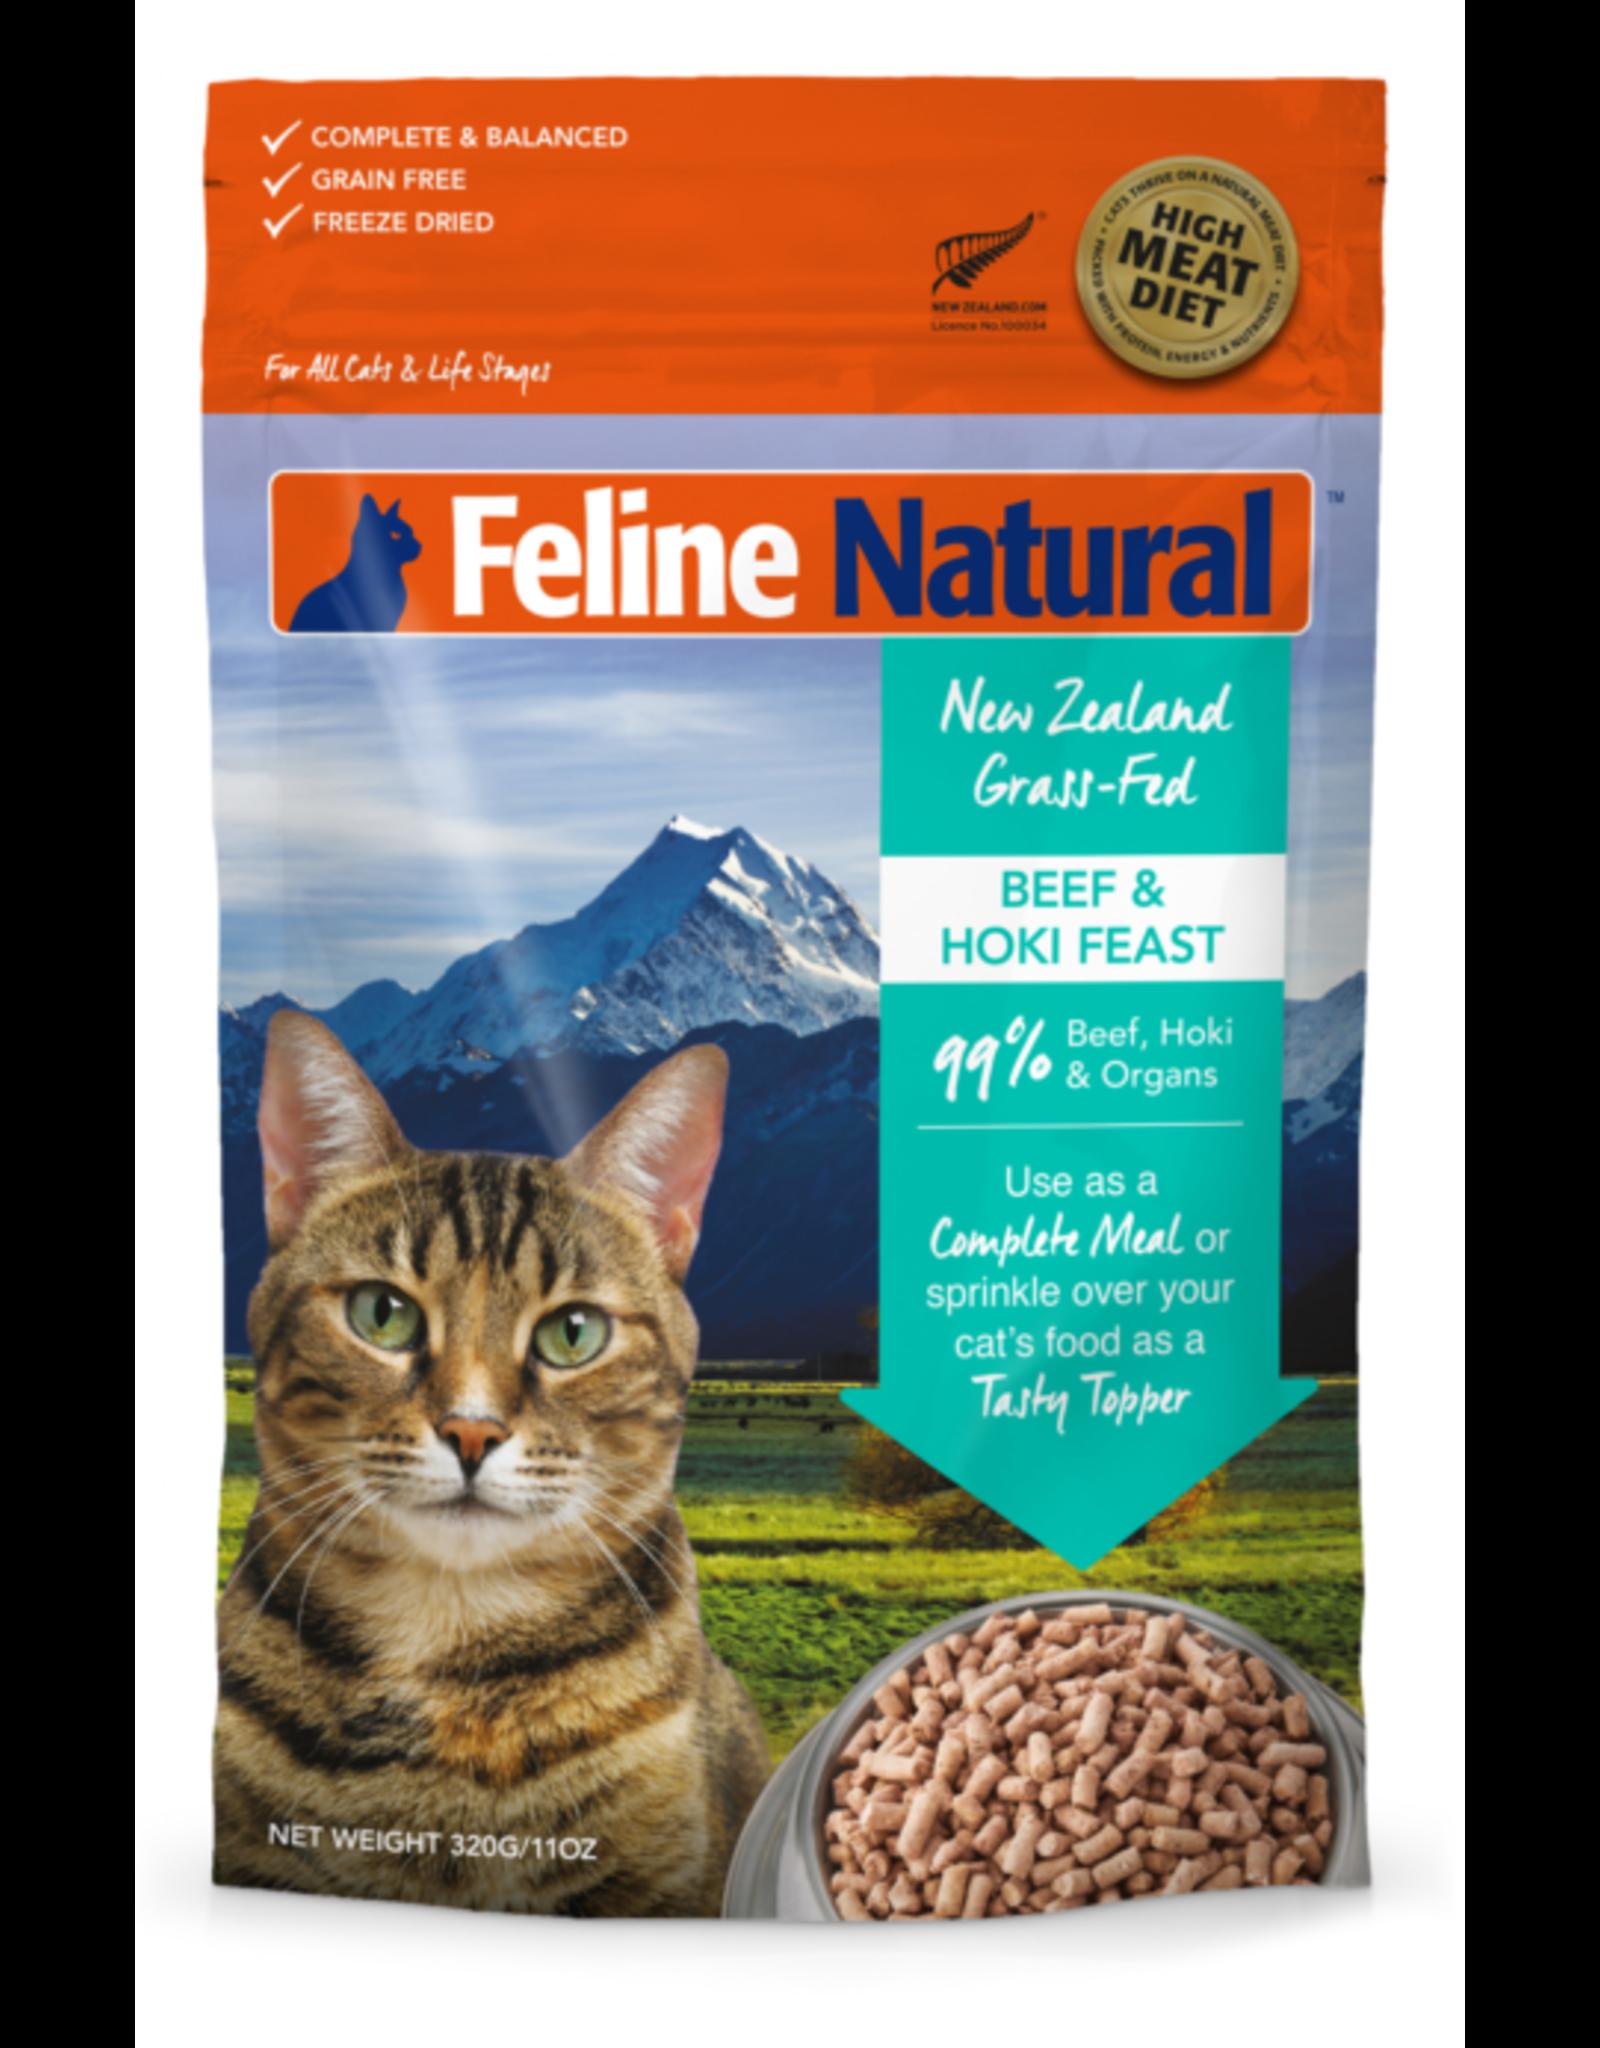 K9 Natural Feline Natural Freeze Dried Topper Beef & Hoki 3.5oz